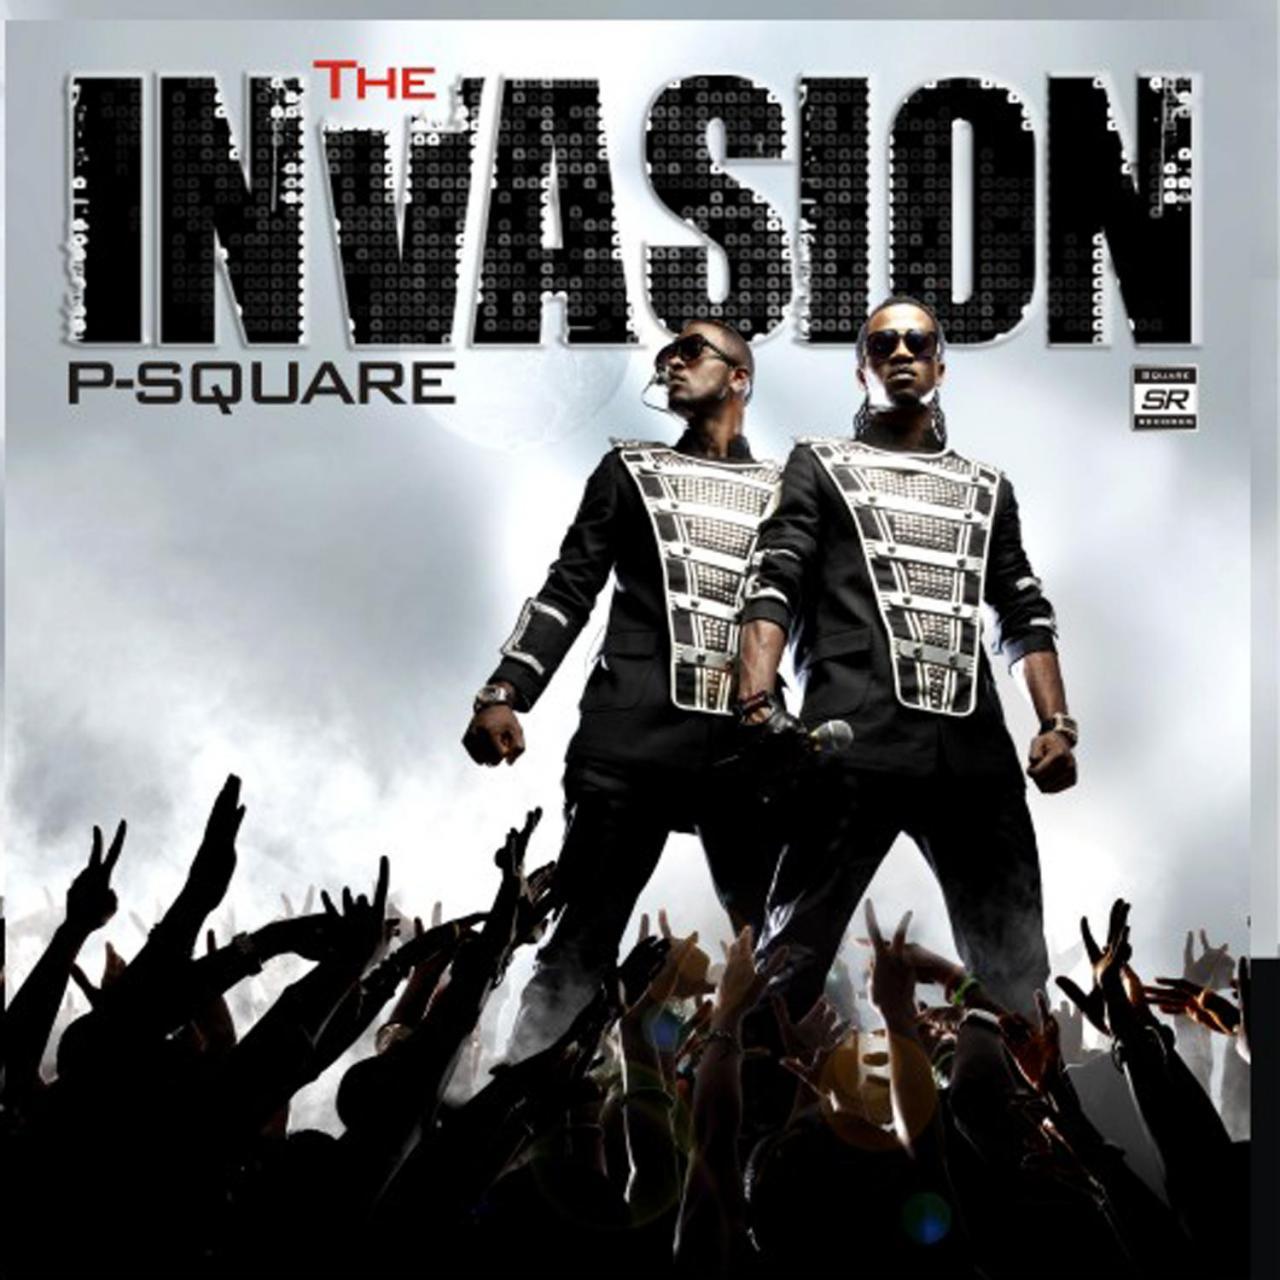 DOWNLOAD: P-Square ft. Waje – Jeje (mp3)